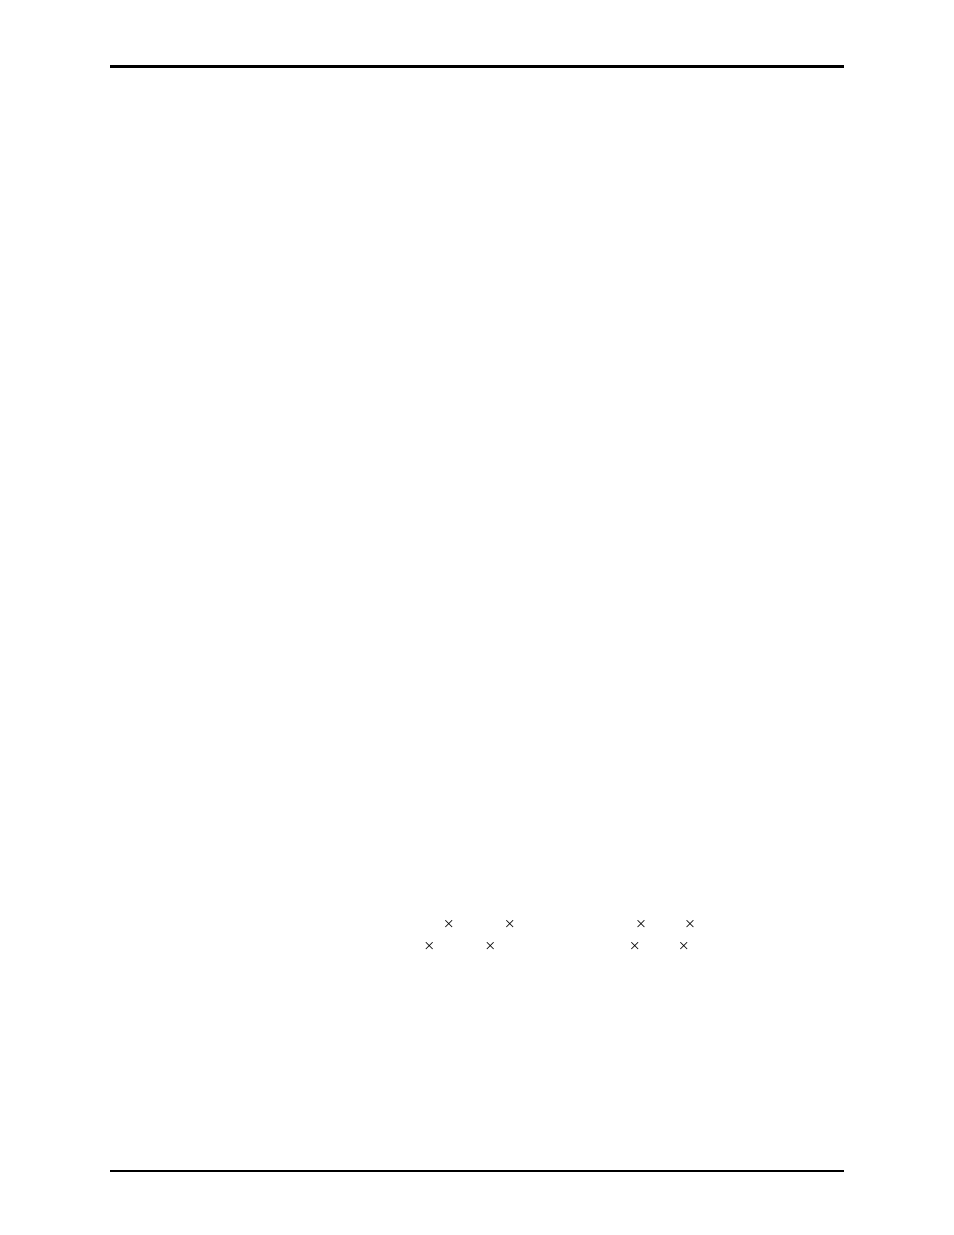 Specifications   GAI-Tronics 701-202 Handset/Speaker Amplifier User